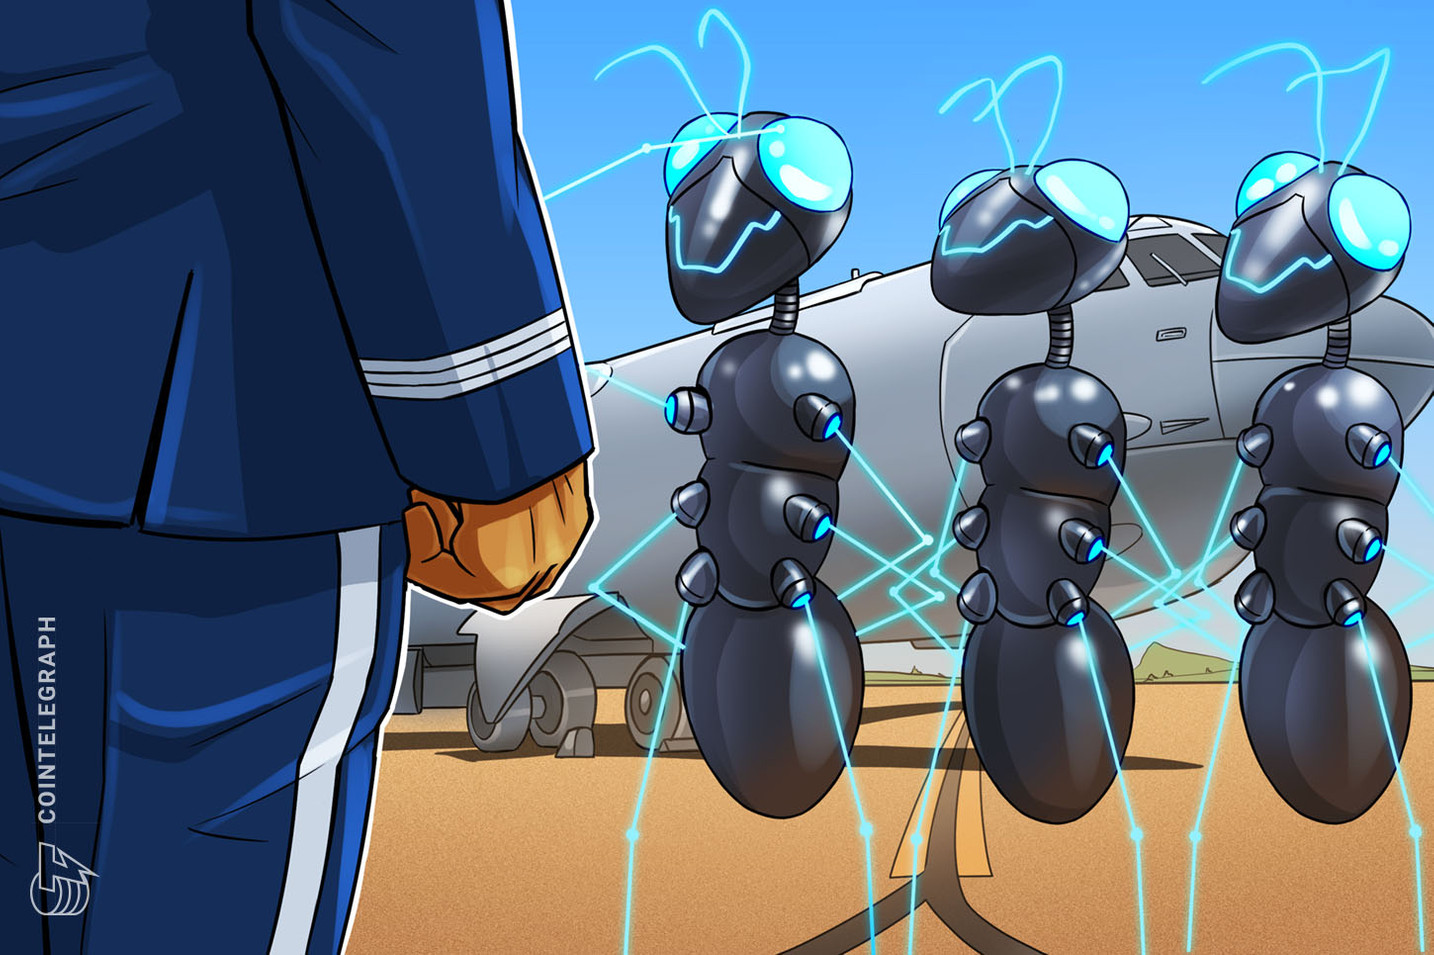 Startup blockchain ganha outro contrato do Departamento de Defesa dos EUA